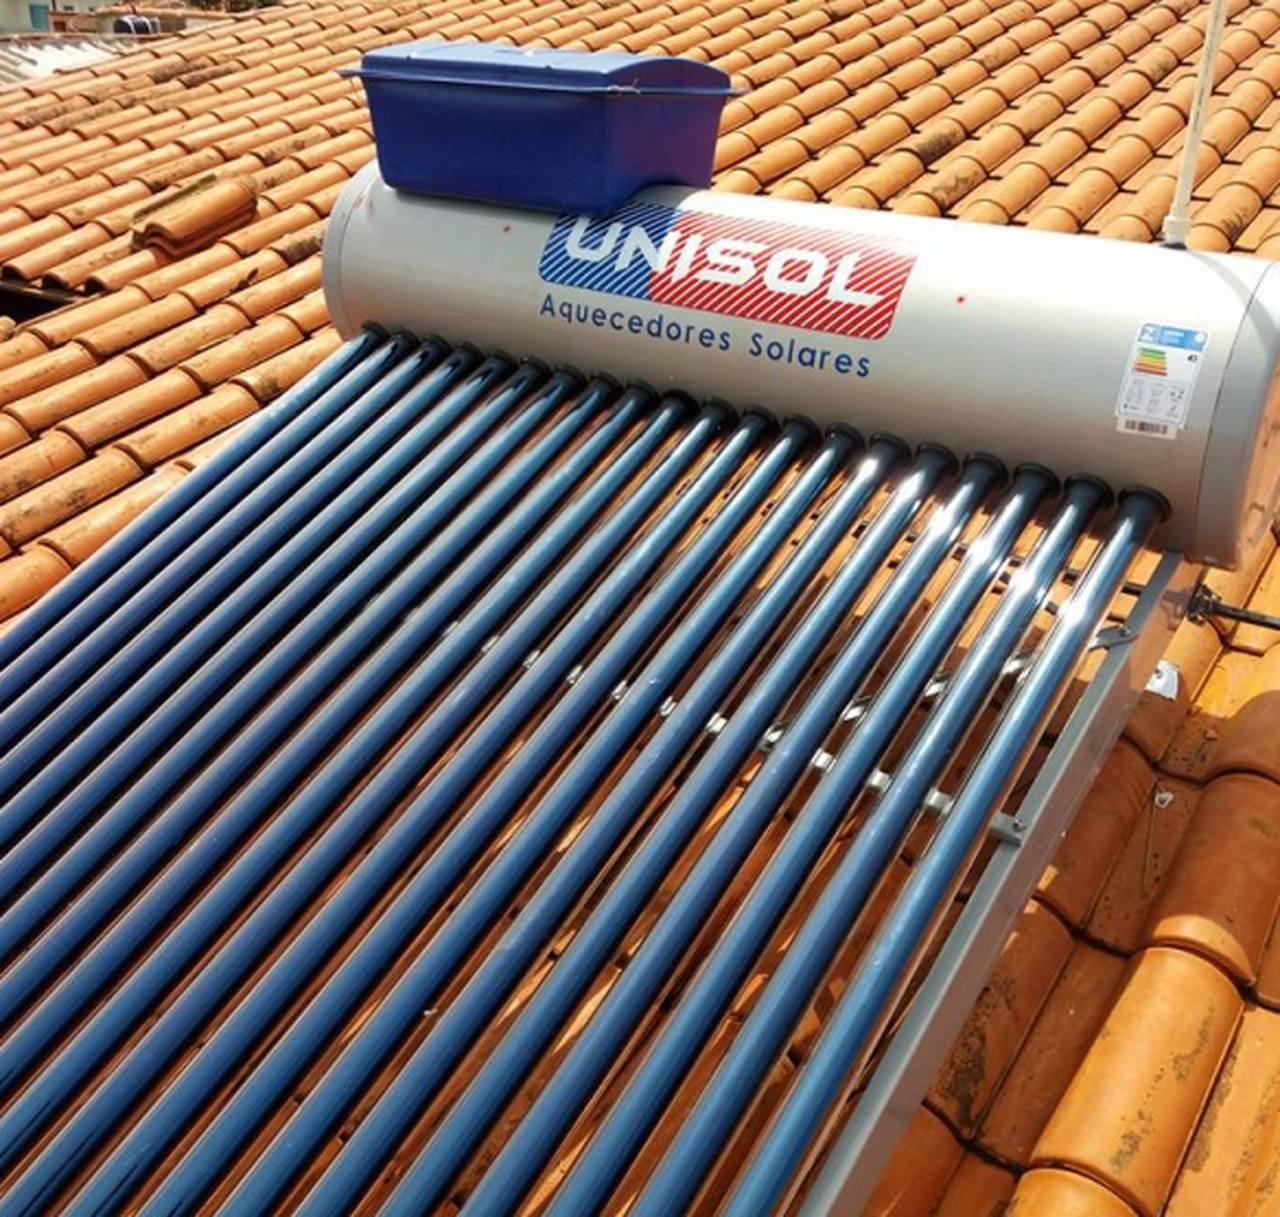 Aquecedor Solar a Vácuo 150 Litros UNISOL 15 Tubos + Caixa Auxiliar